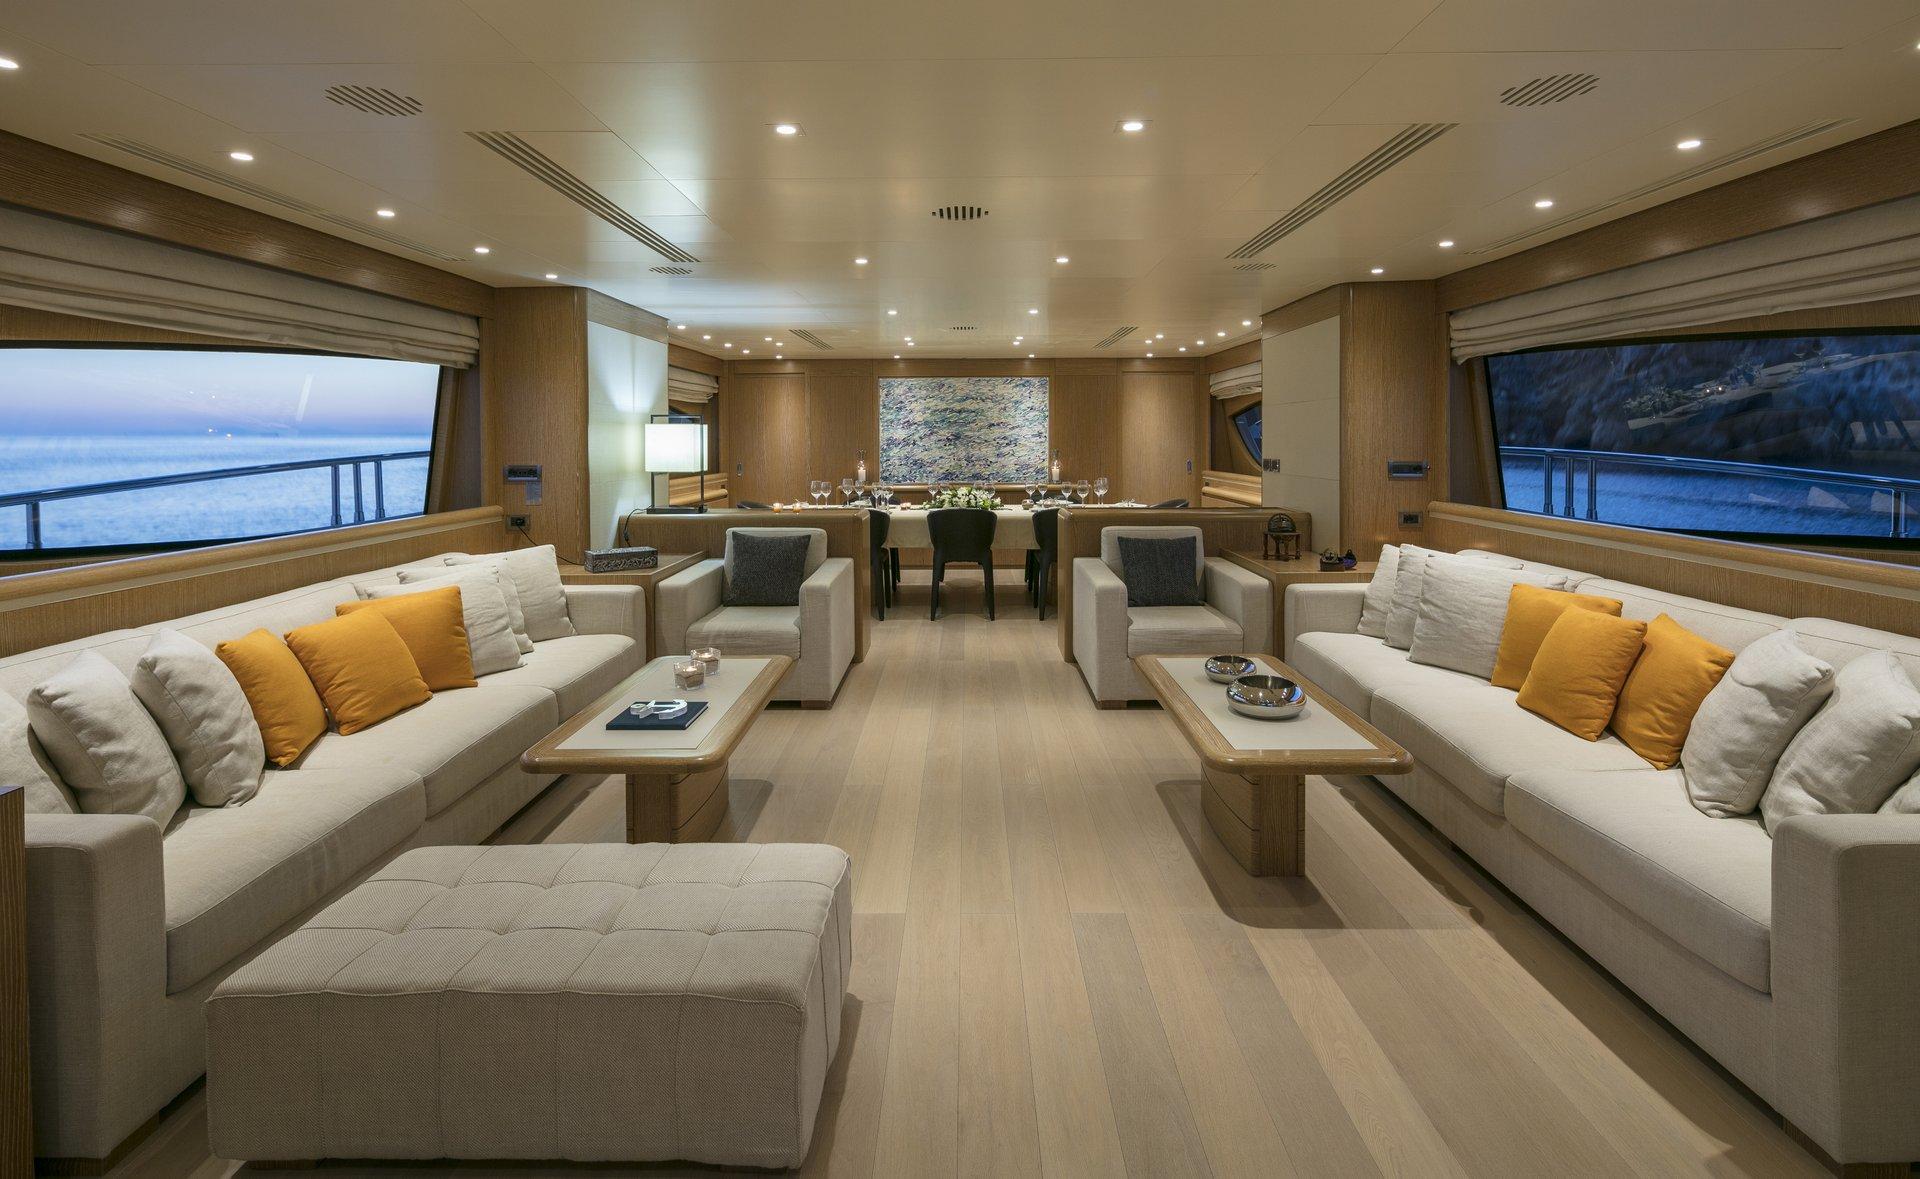 M/Y RINI V yacht for charter living room